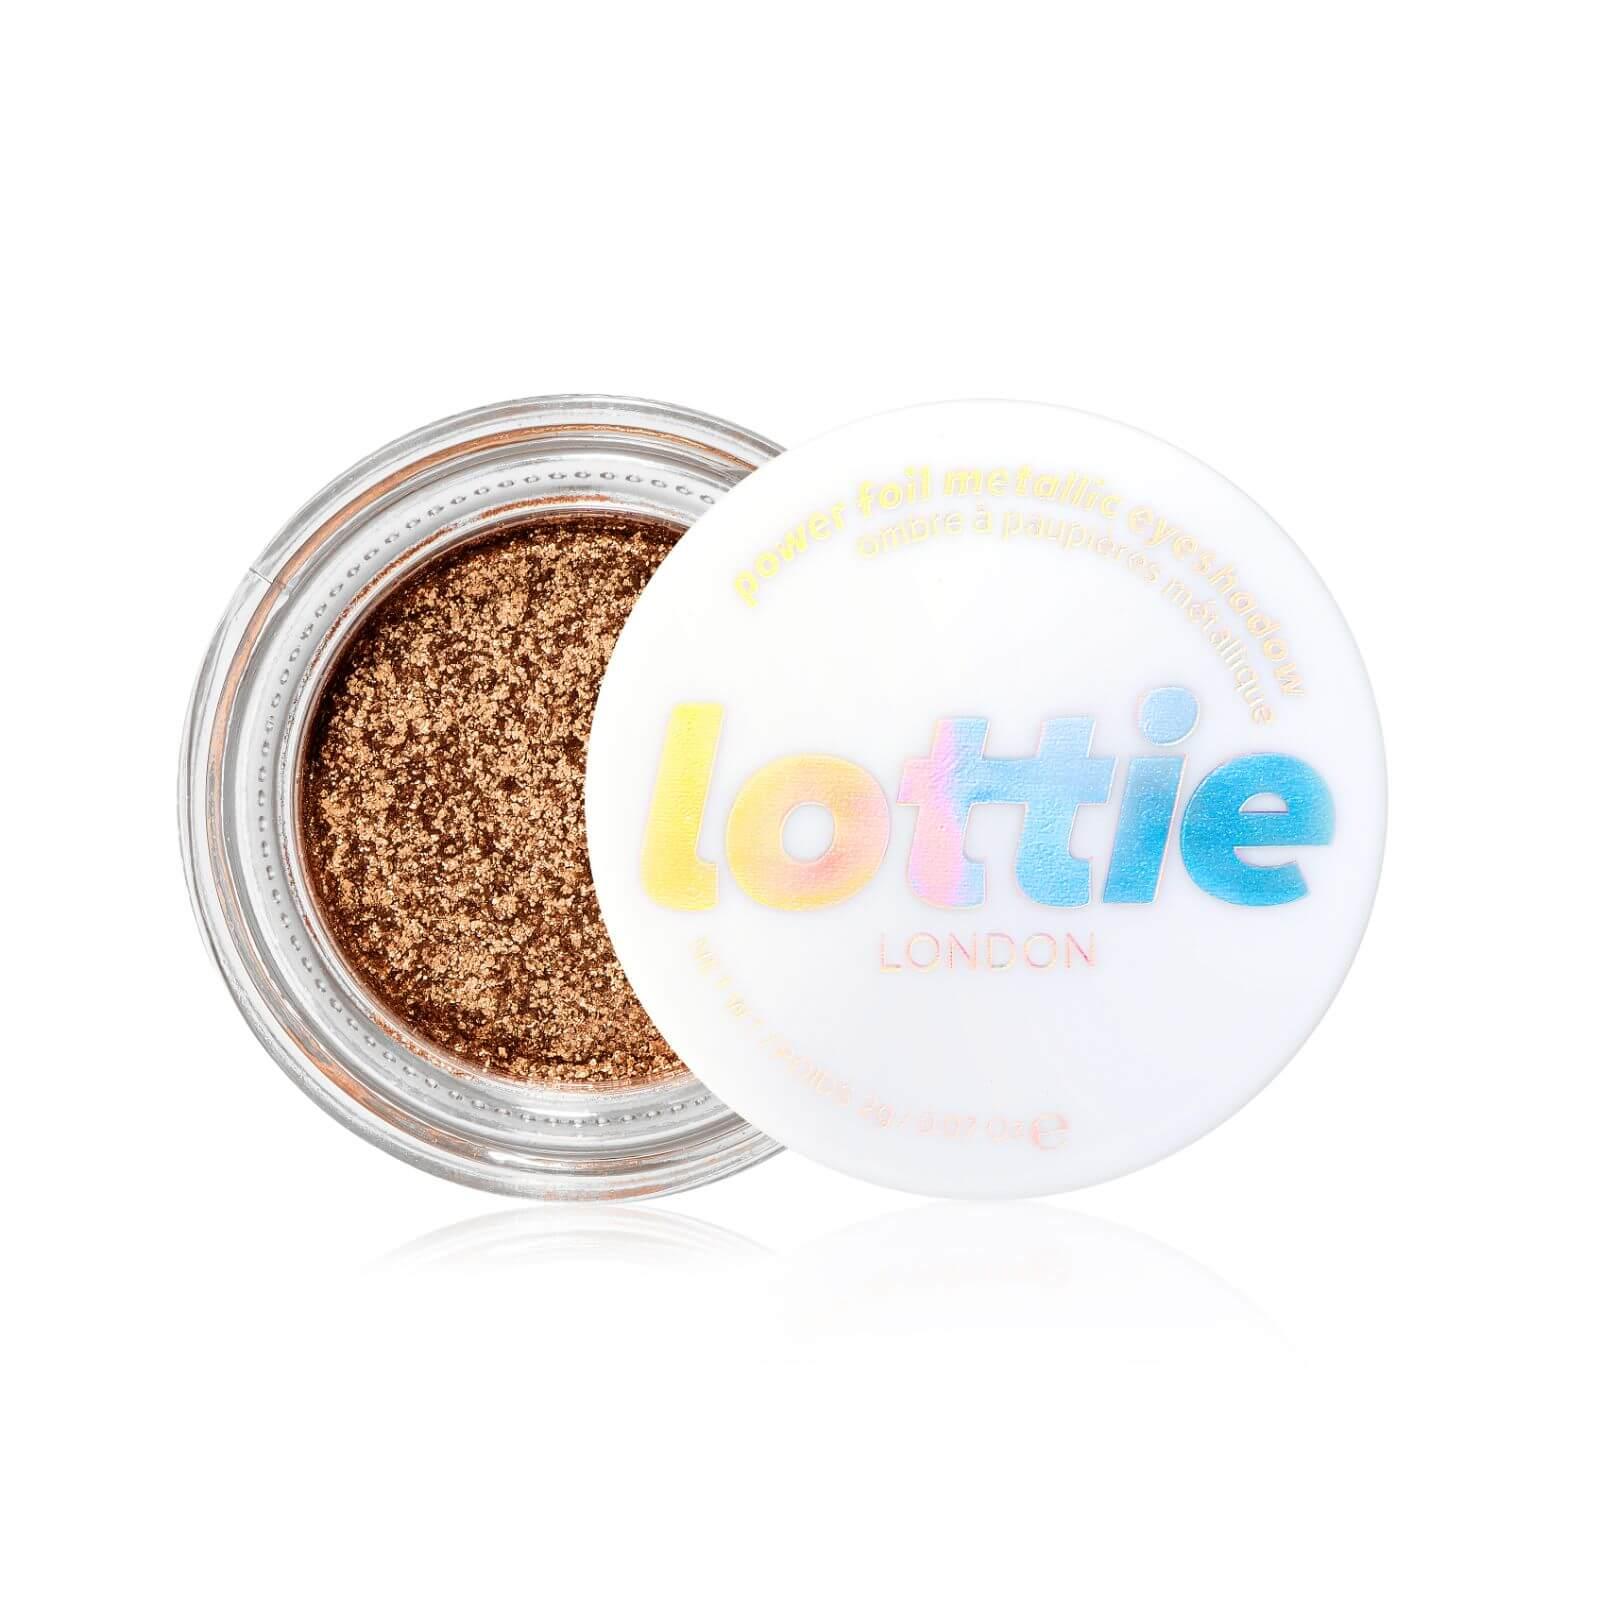 Купить Lottie London Power Foil 4g (Various Shades) - Golden Hour